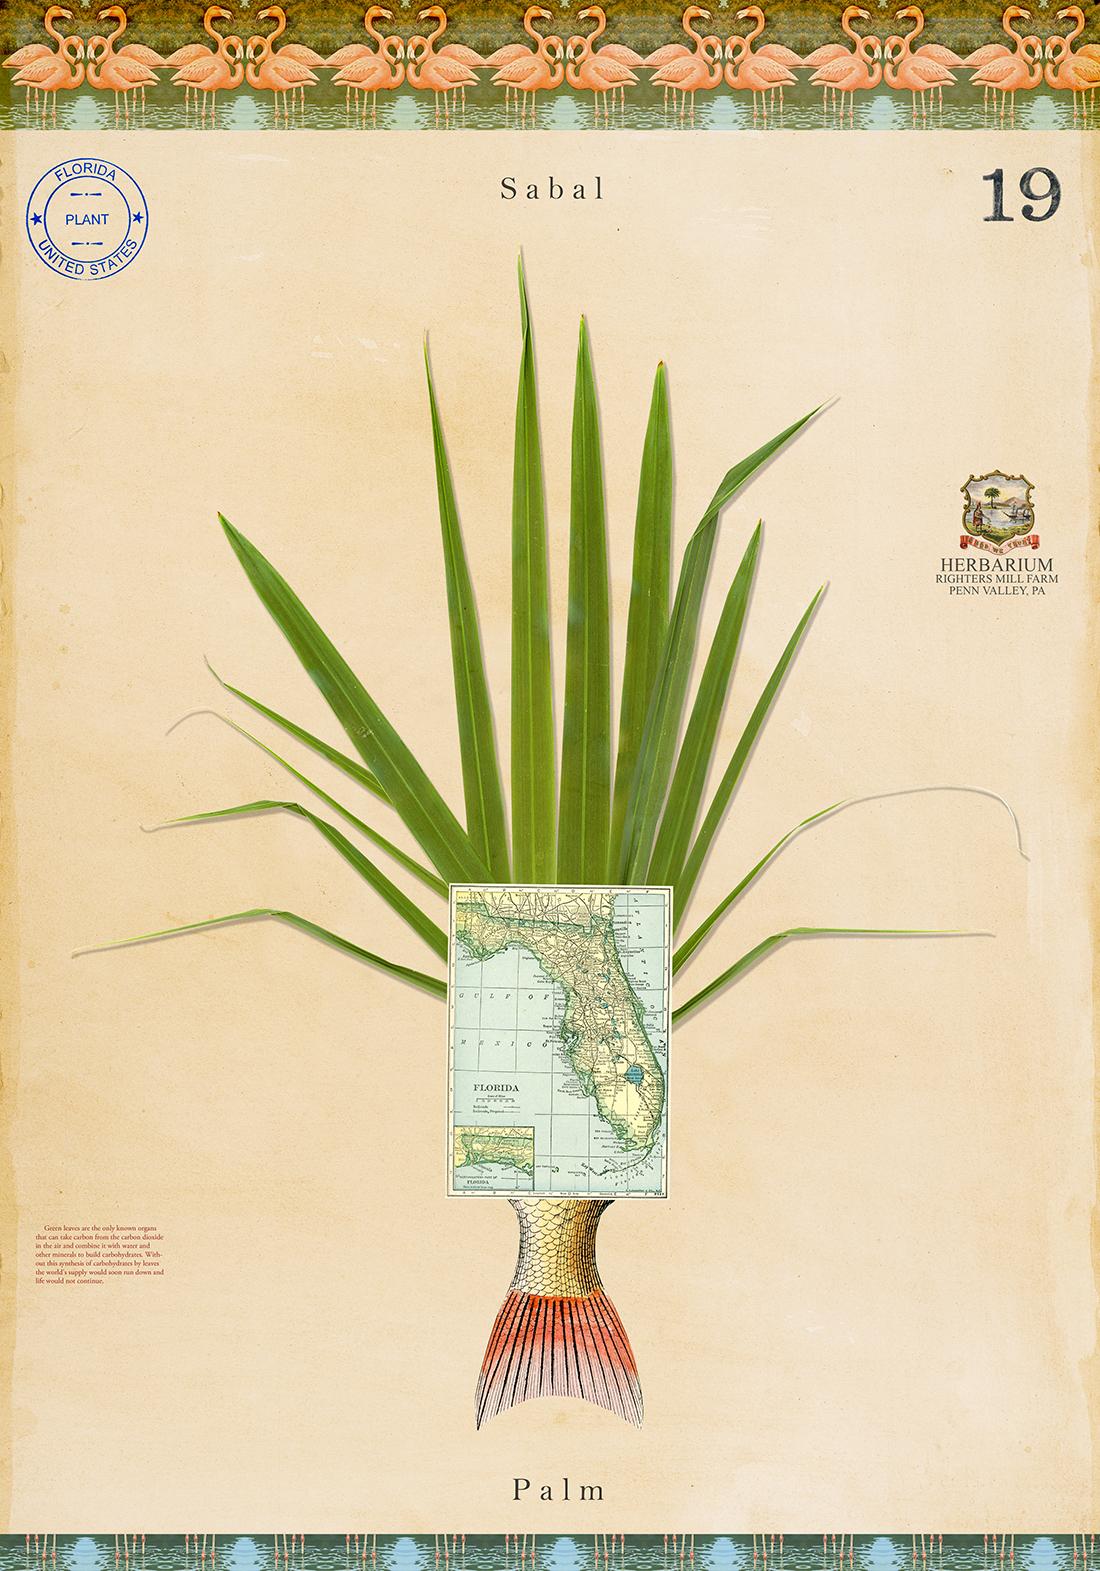 Sabal Palm with Map